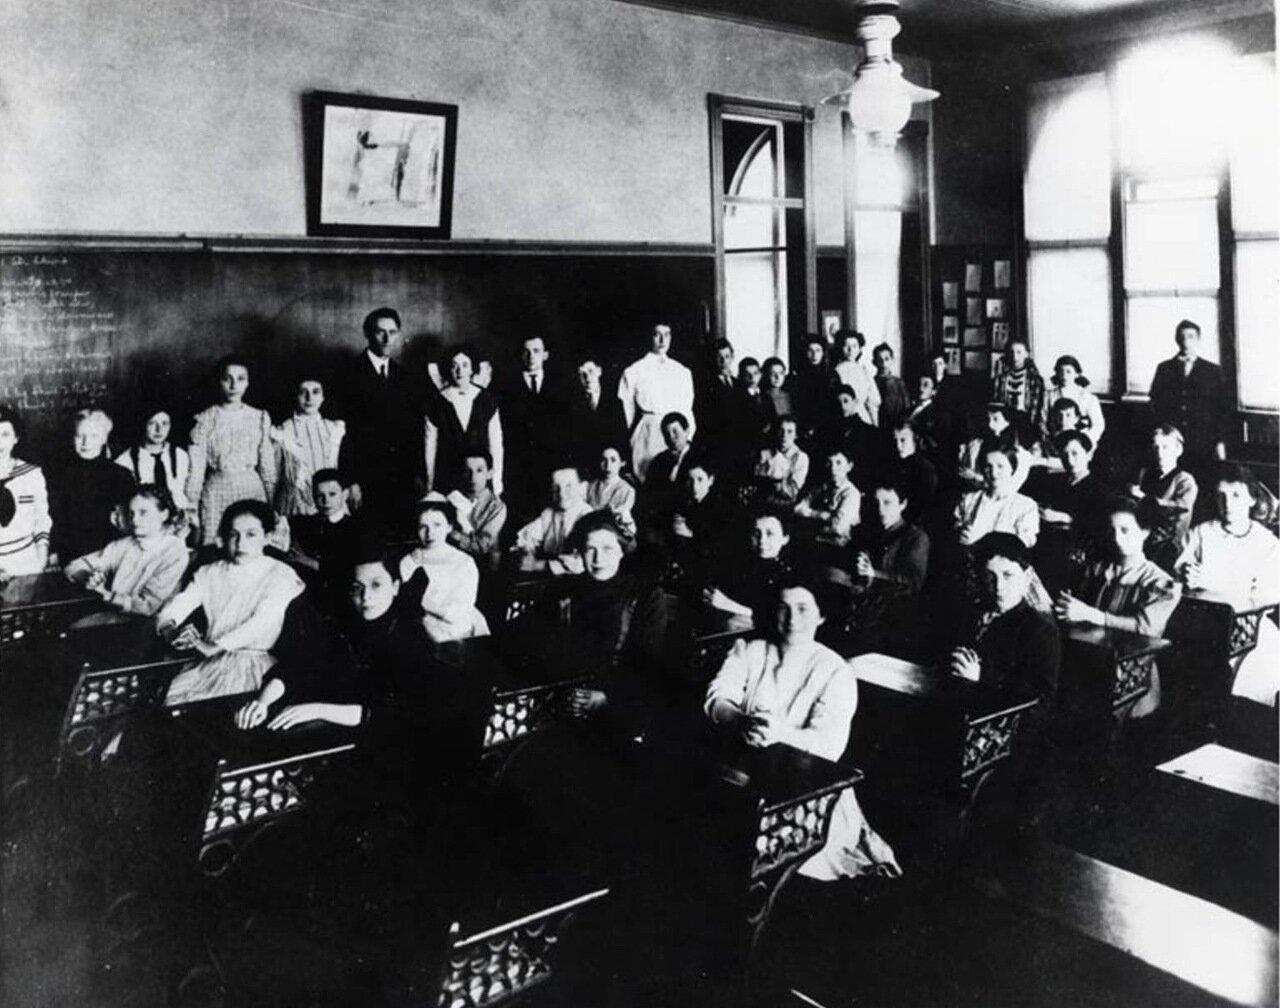 1911. Голда Меир в 8-м классе в 4-й школе в Милуоки, Висконсин